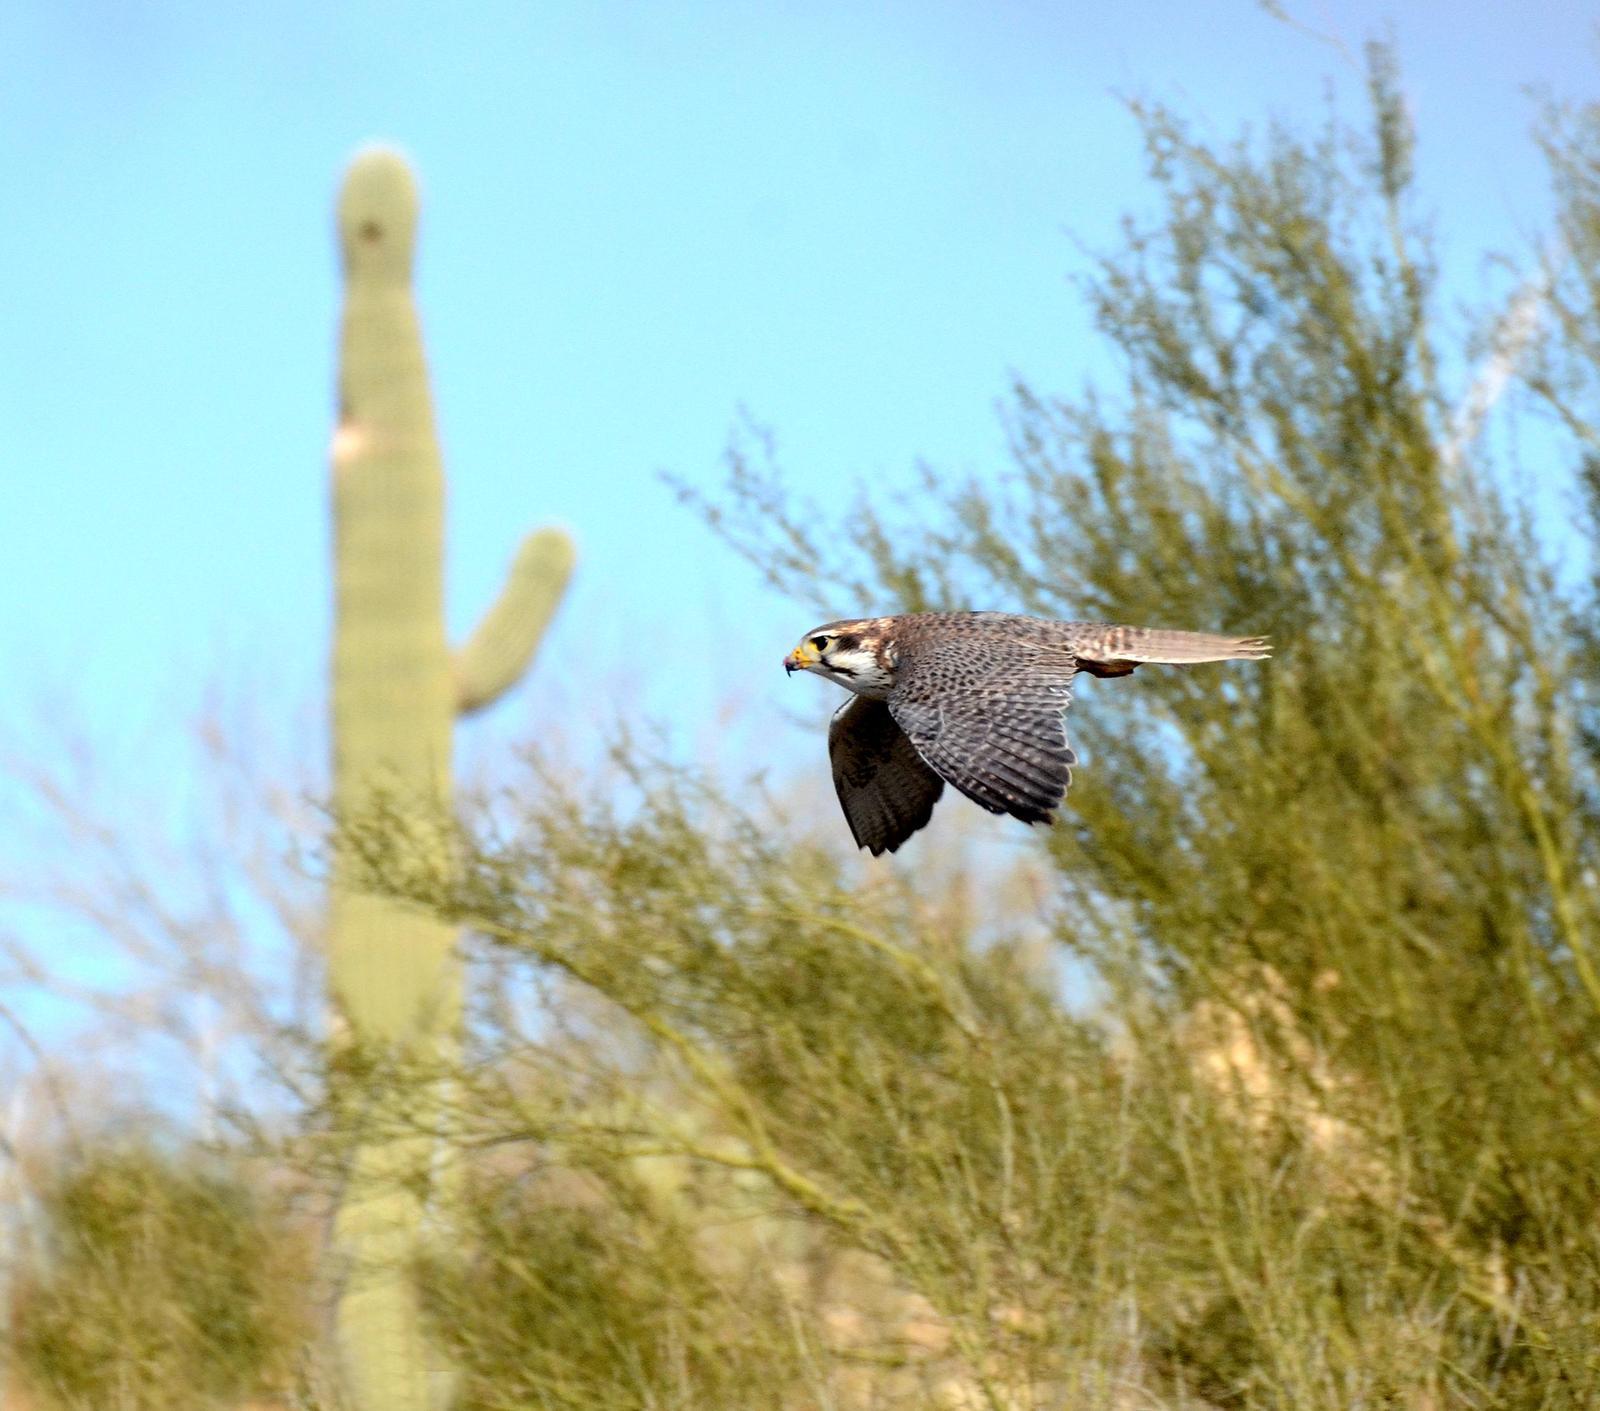 Prairie Falcon Photo by Steven Mlodinow